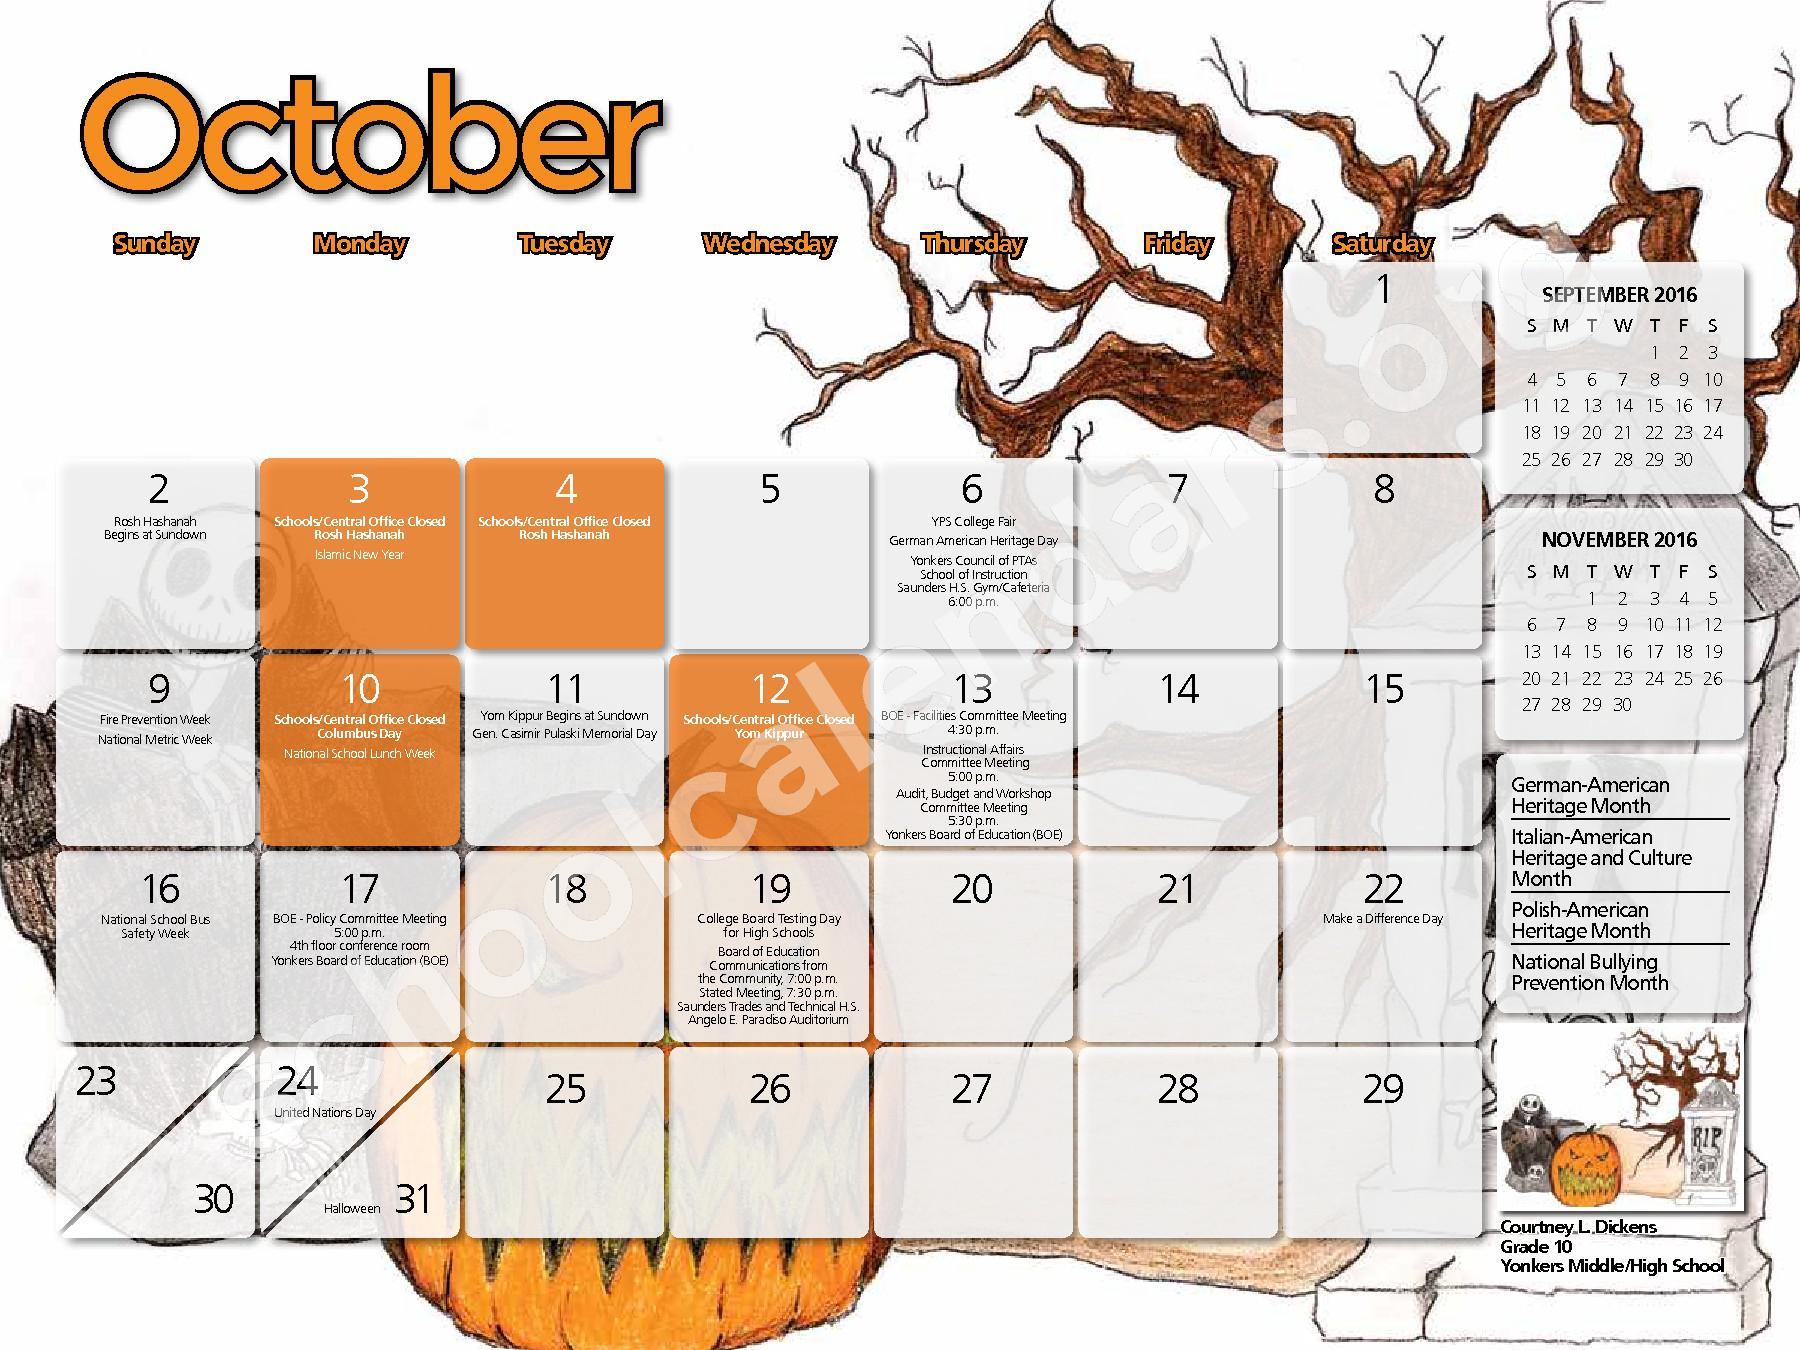 2016 - 2017  District Calendar – Yonkers City School District – page 2